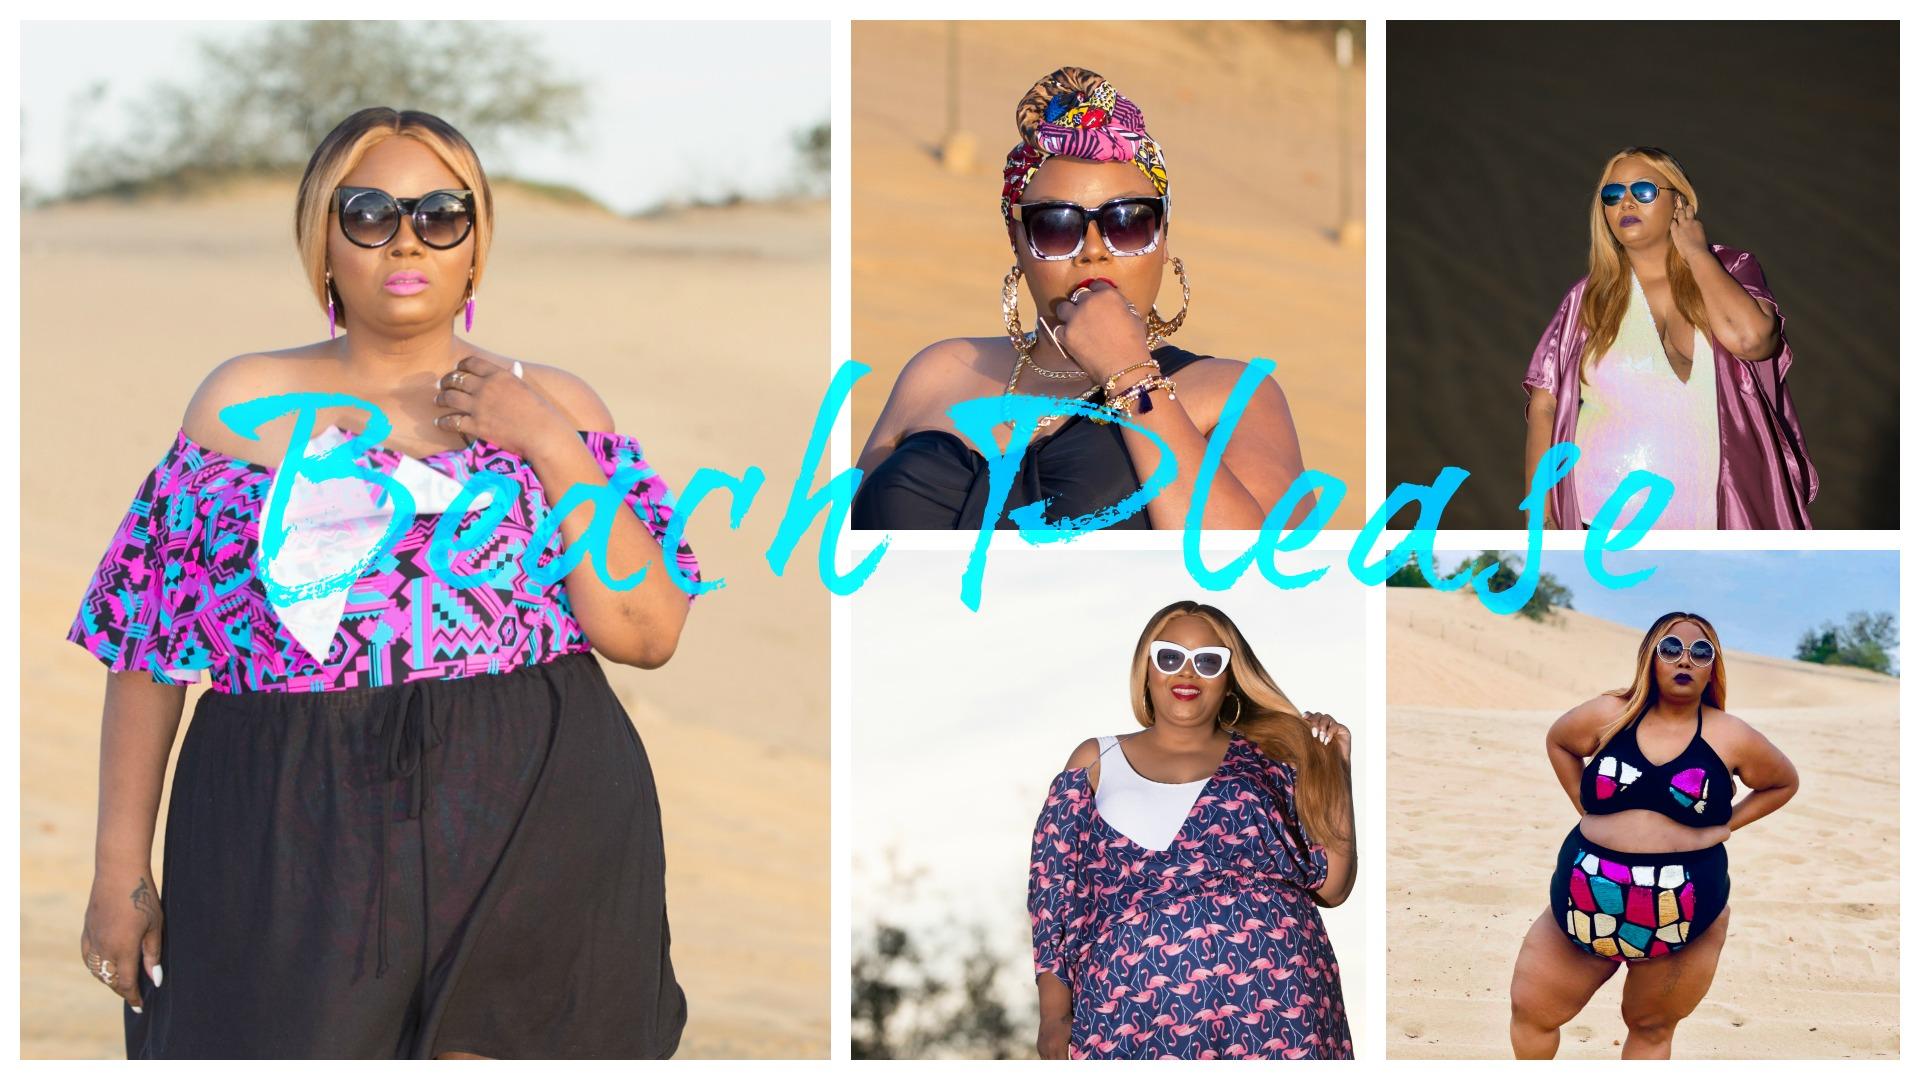 Beach Please collage by PHAT Girl Fresh